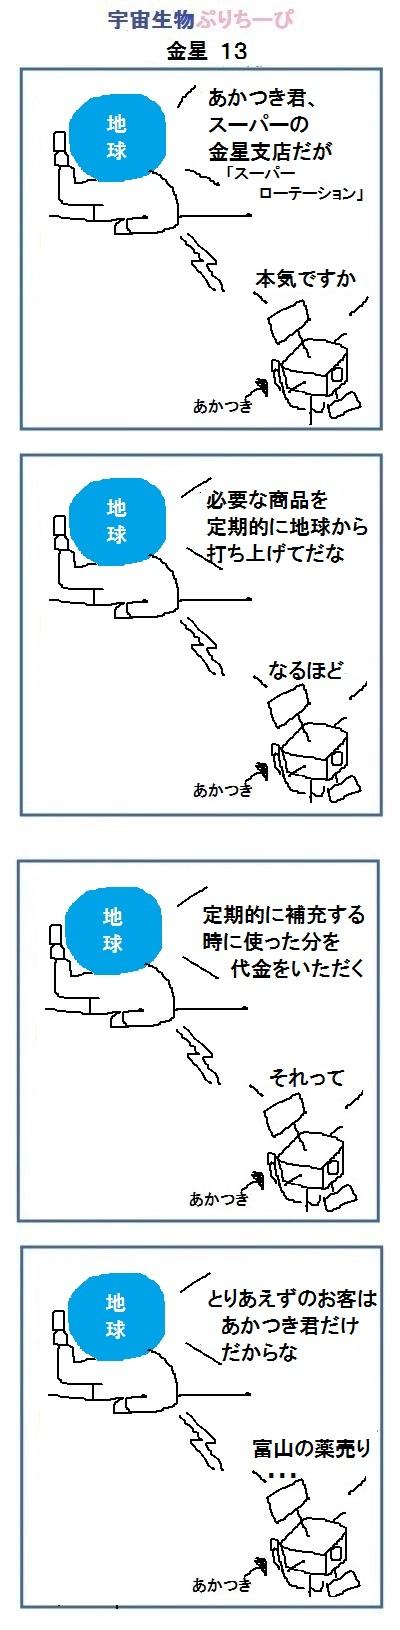 160527_kinsei13.jpg